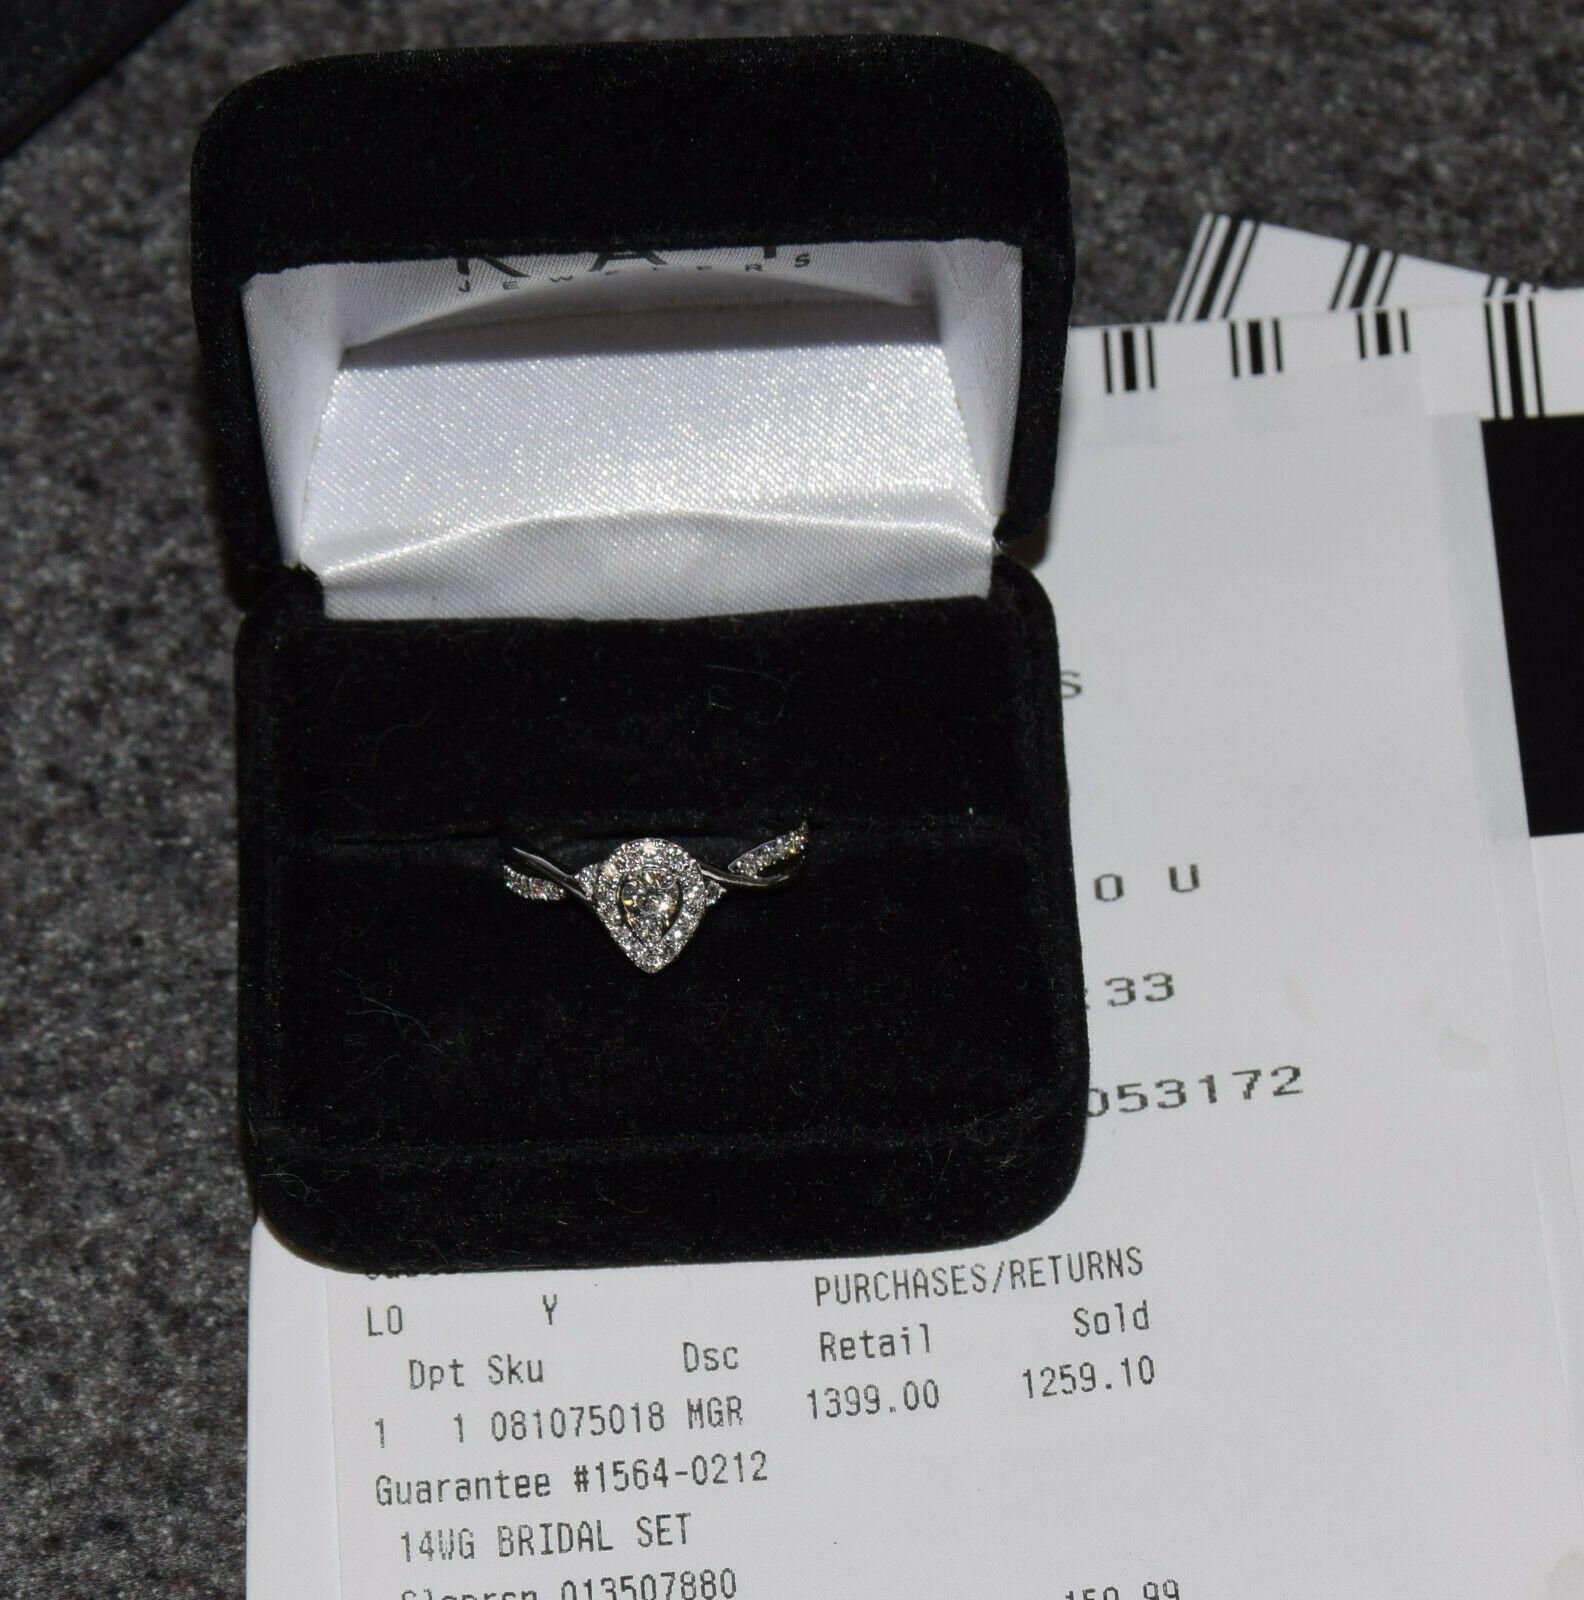 Kay Jewelers 3 8 Cttw 14k White Gold Diamond Halo Engagement Ring 081075018 Sz 6 Black Diamond Ring Engagement Black Diamond Ring Kay Jewelers Engagement Rings